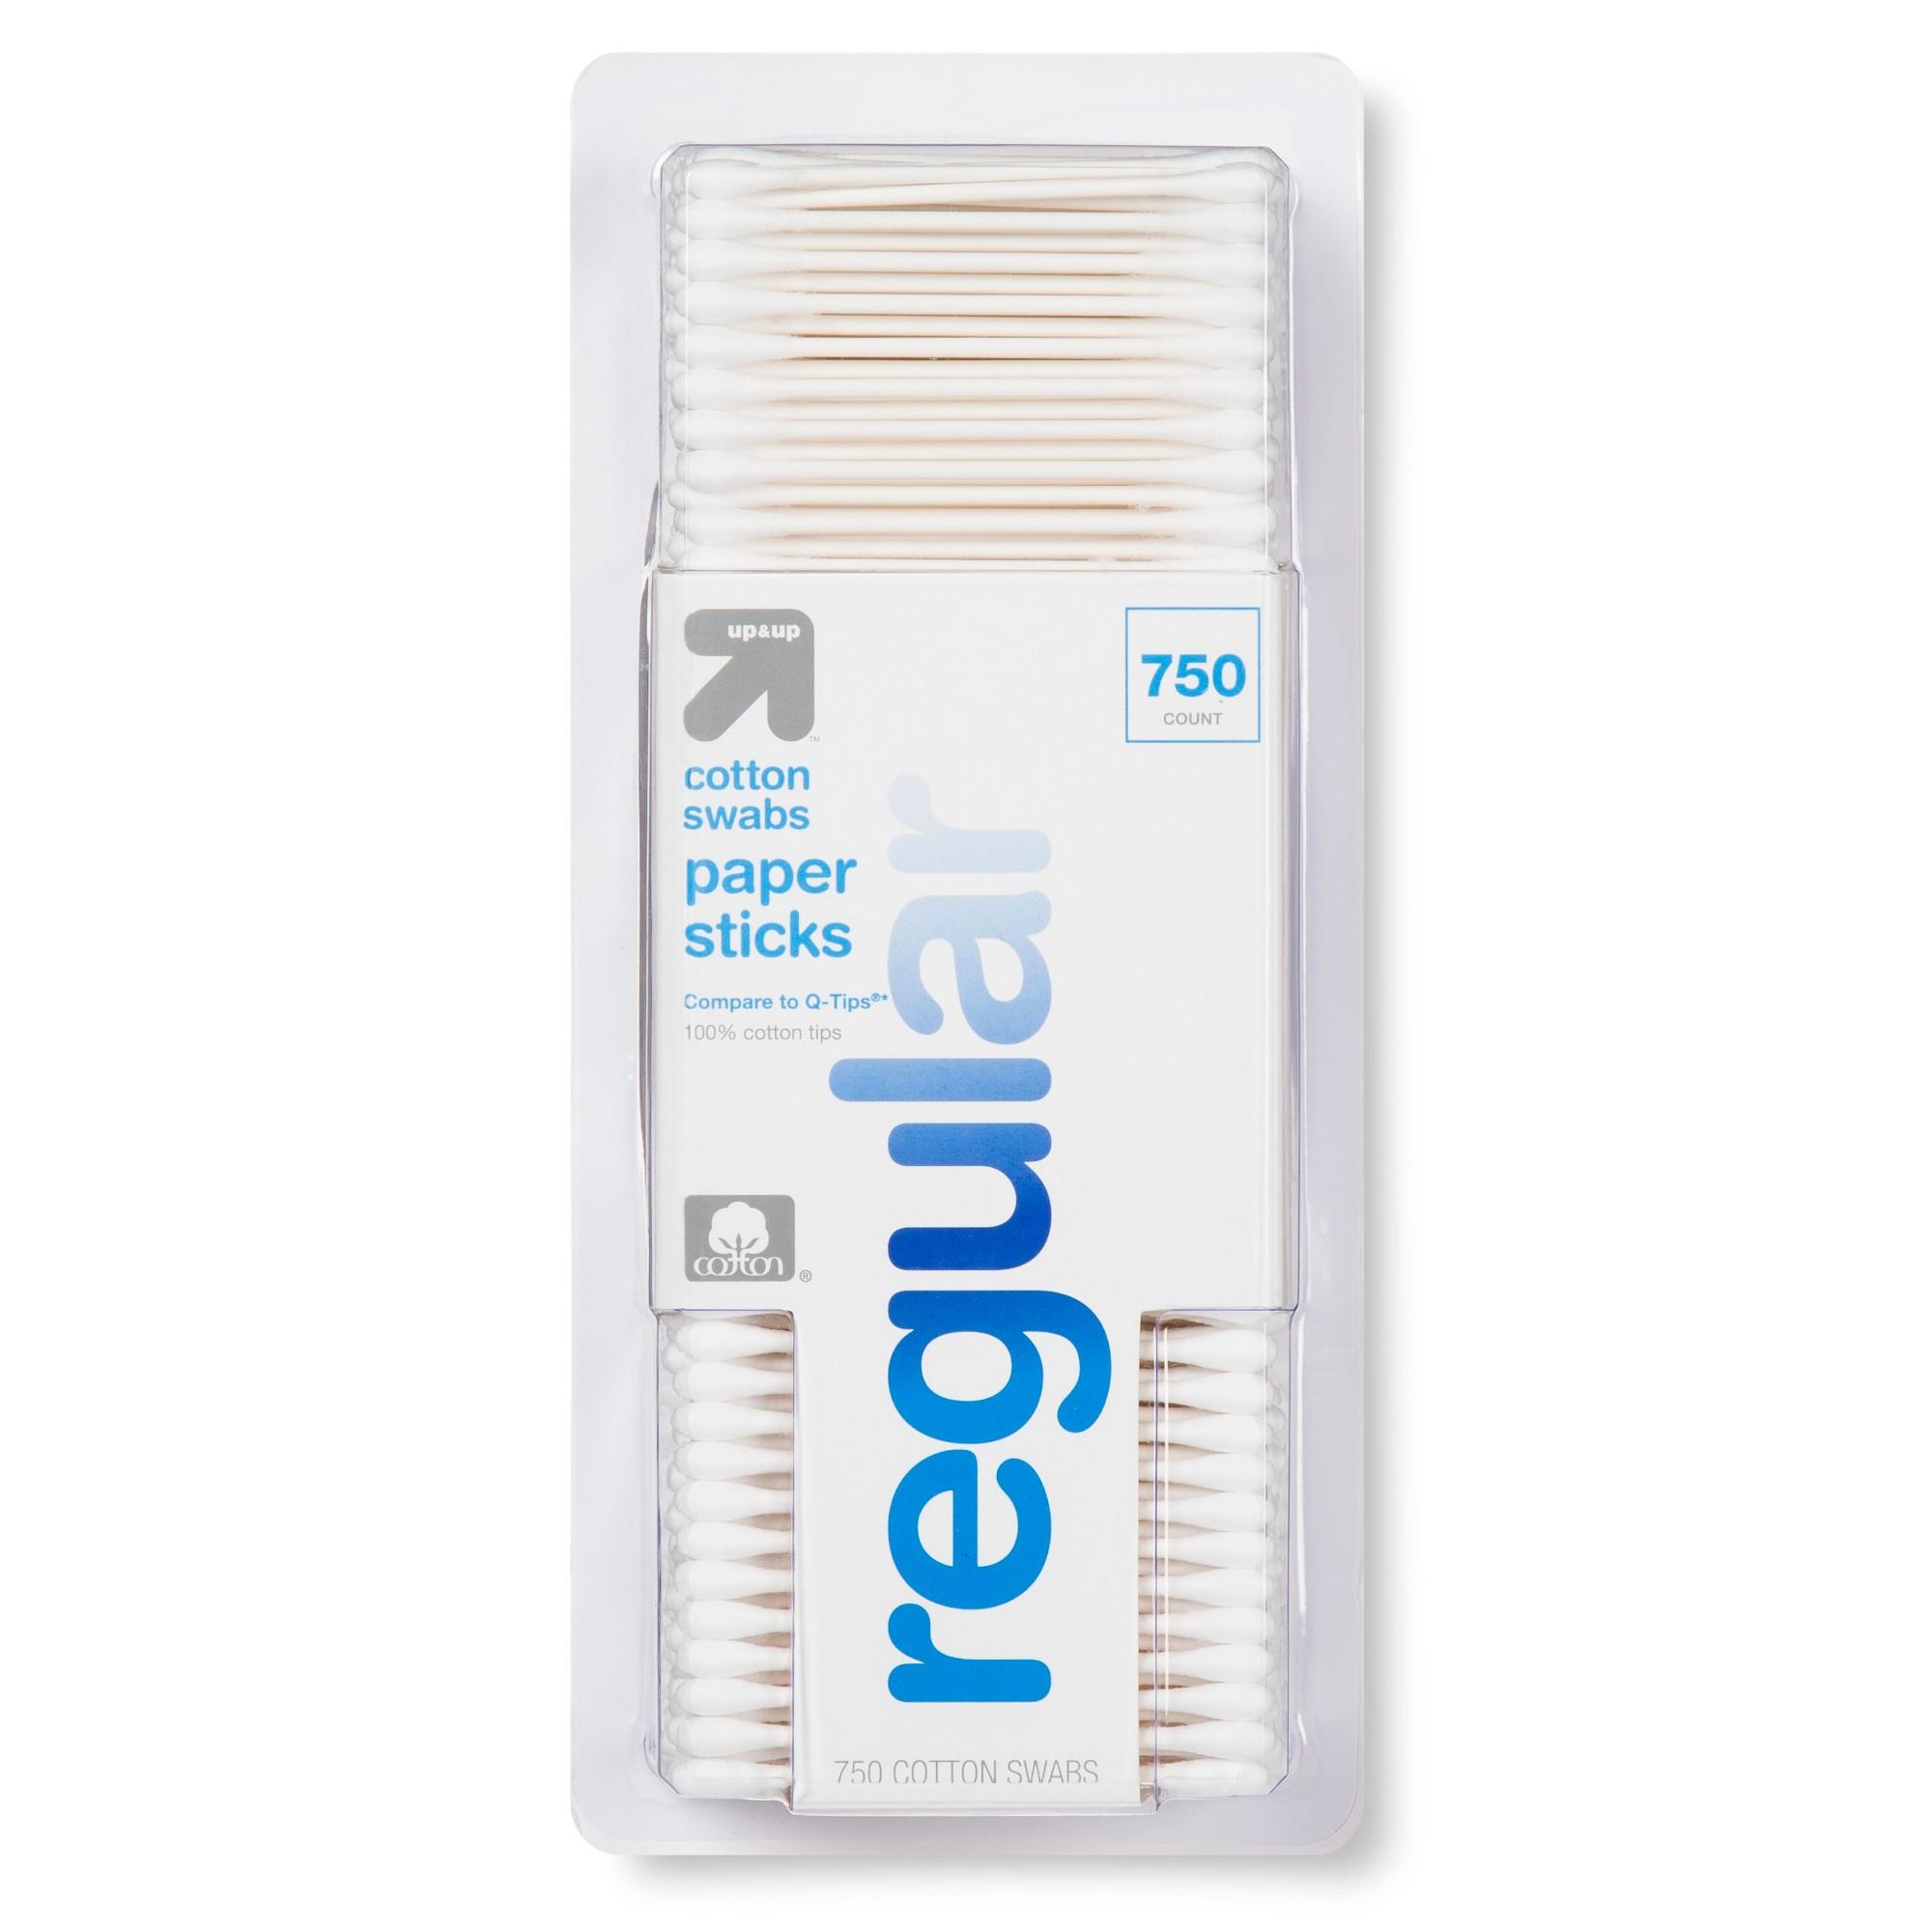 Regular Cotton Swabs Paper Sticks - 750ct - Up&Up